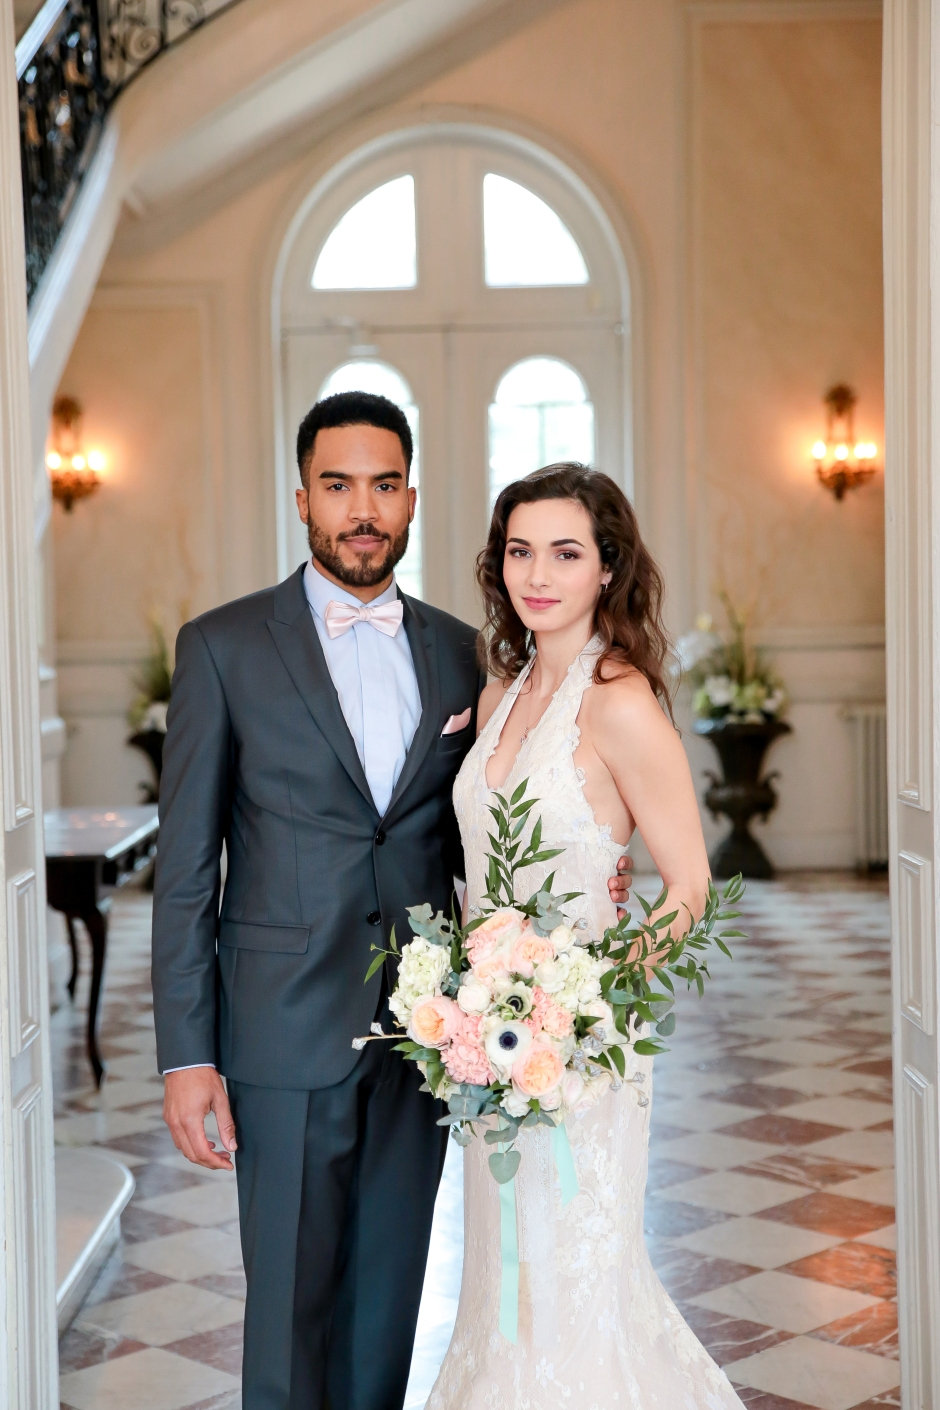 Mariage nude au Chateau de Santeny - La Blogueuse Mariage (19)